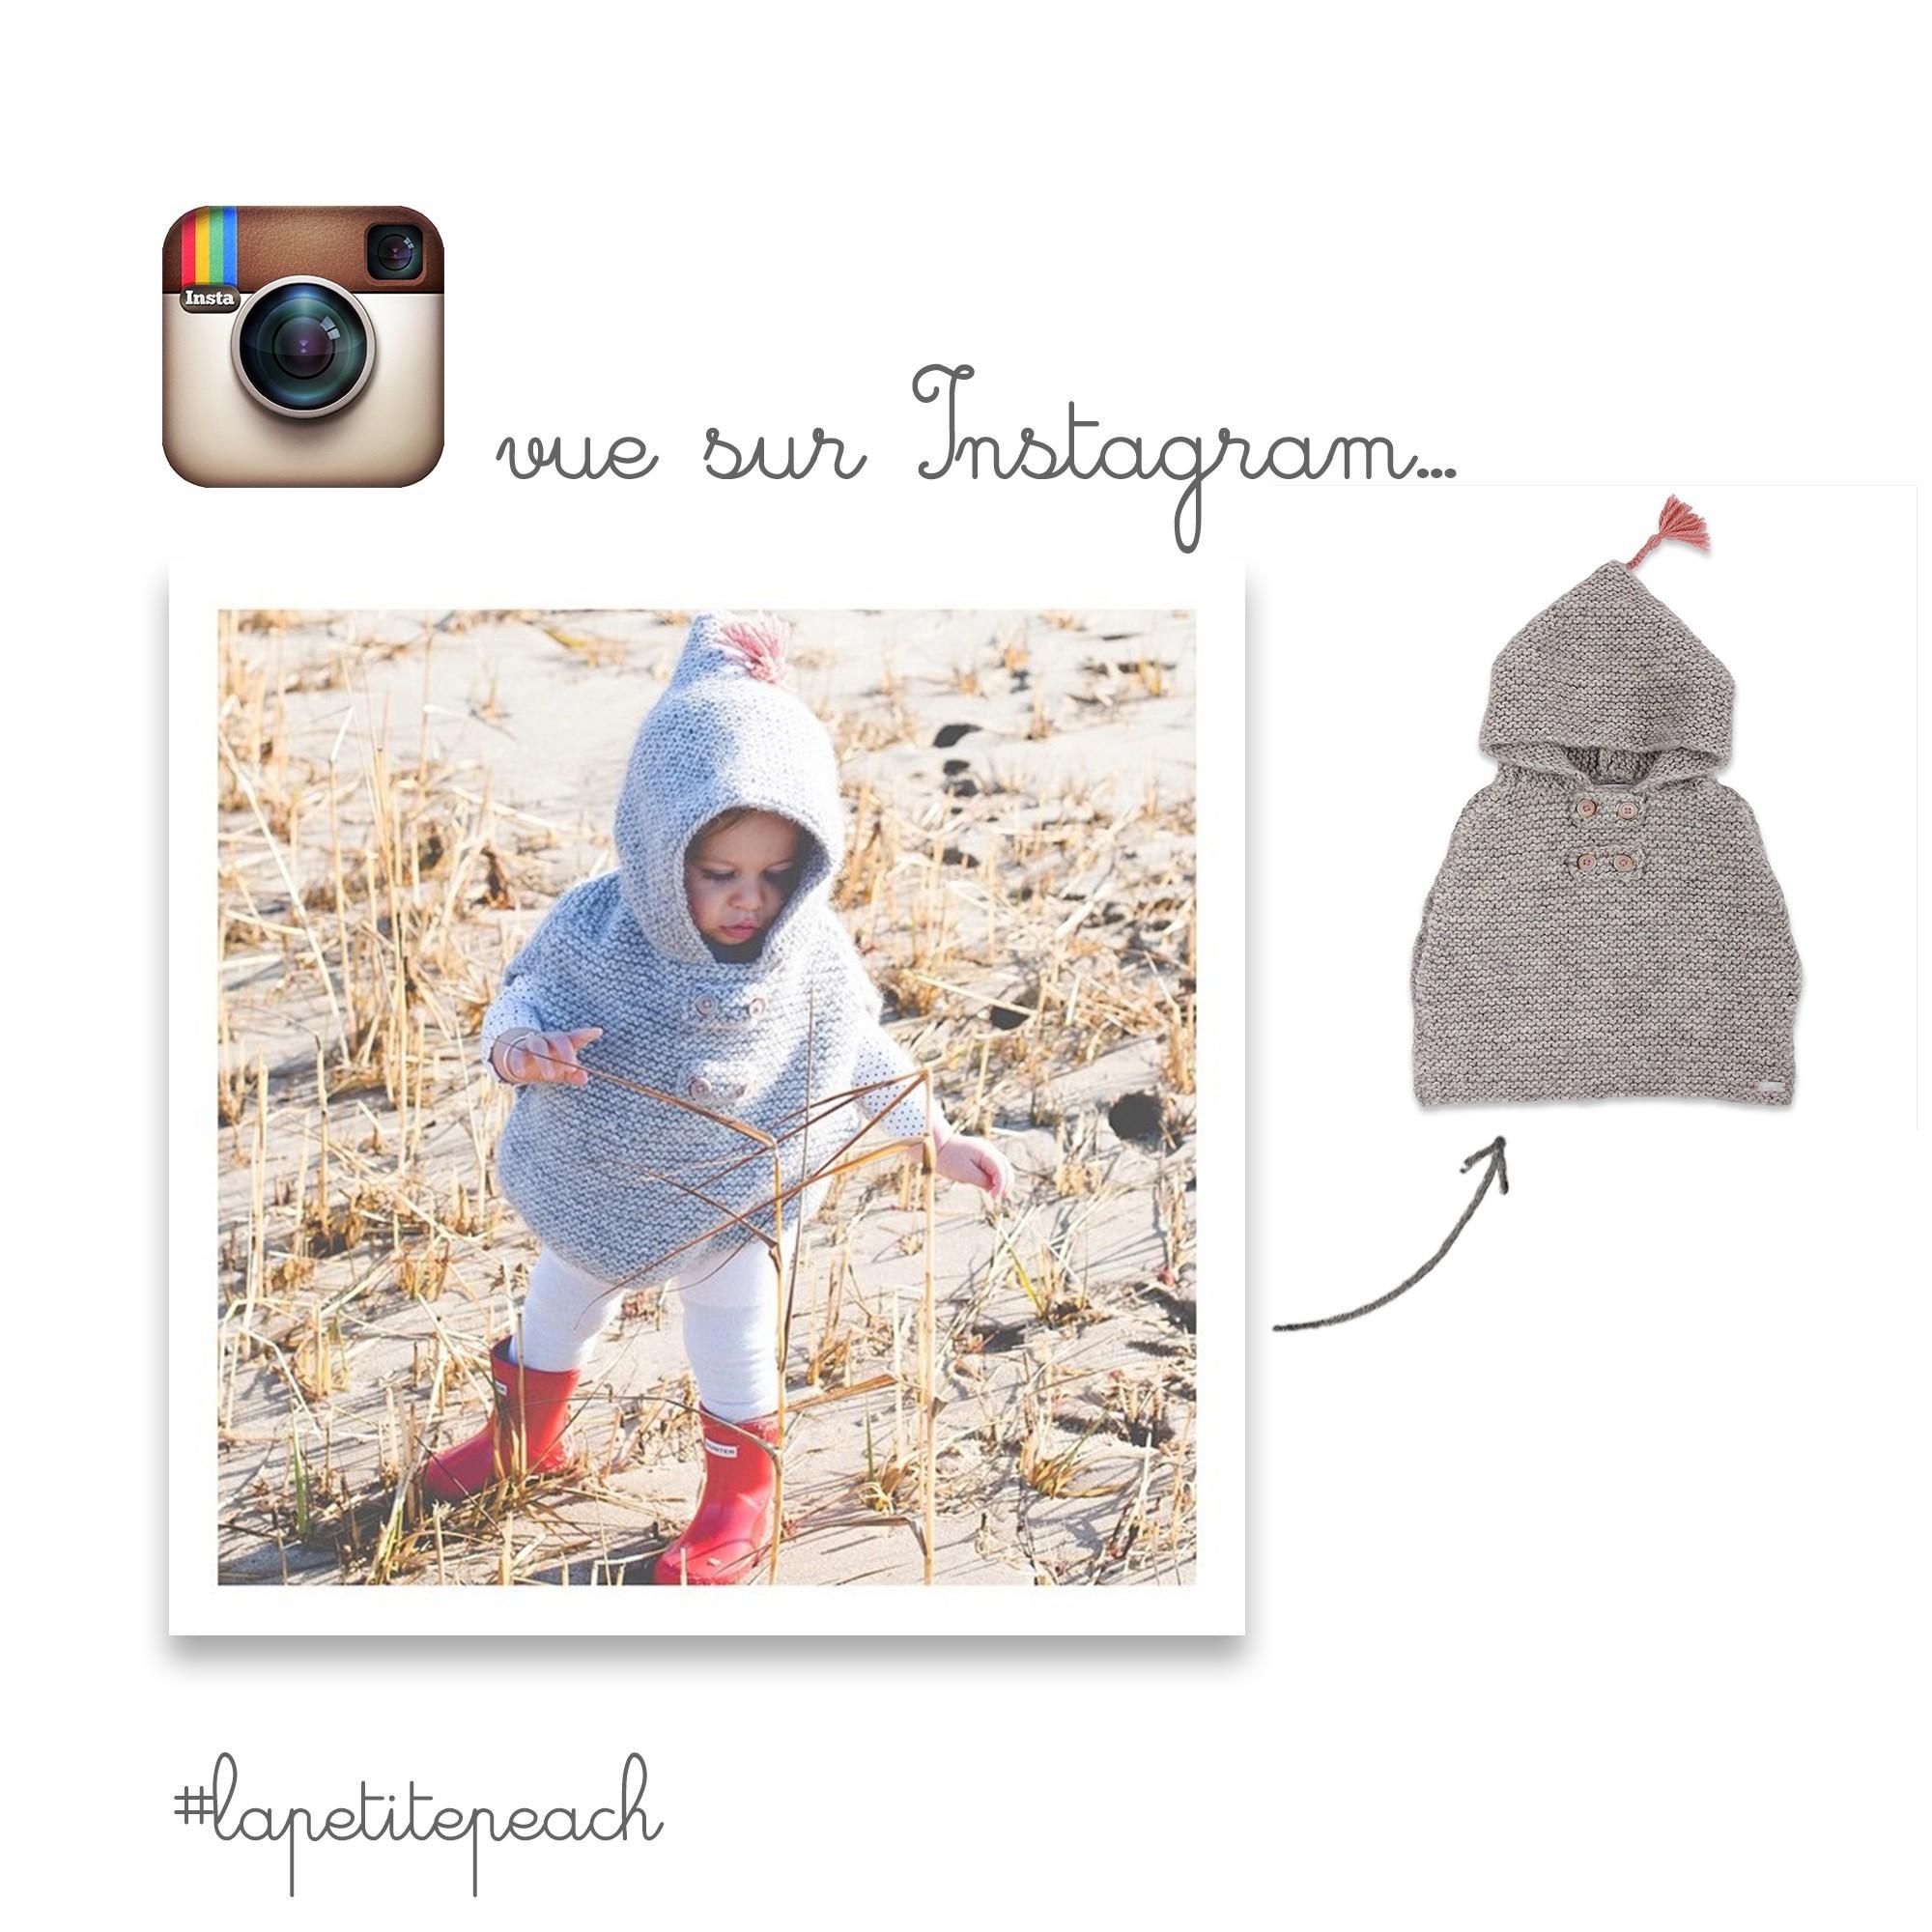 Cape Florentine vue sur Instagram